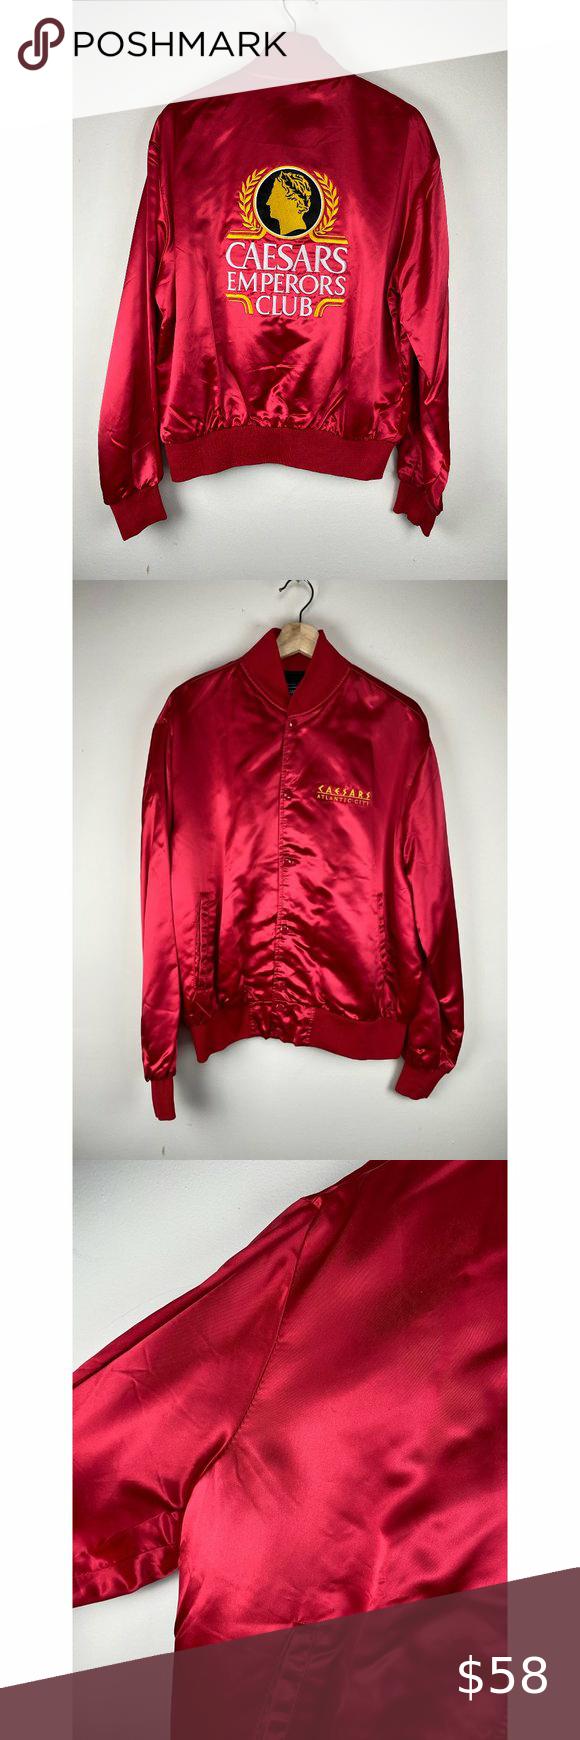 Vintage 1980s Caesar S Red Satin Bomber Jacket Satin Bomber Jacket Vintage Jacket Bomber Jacket [ 1740 x 580 Pixel ]